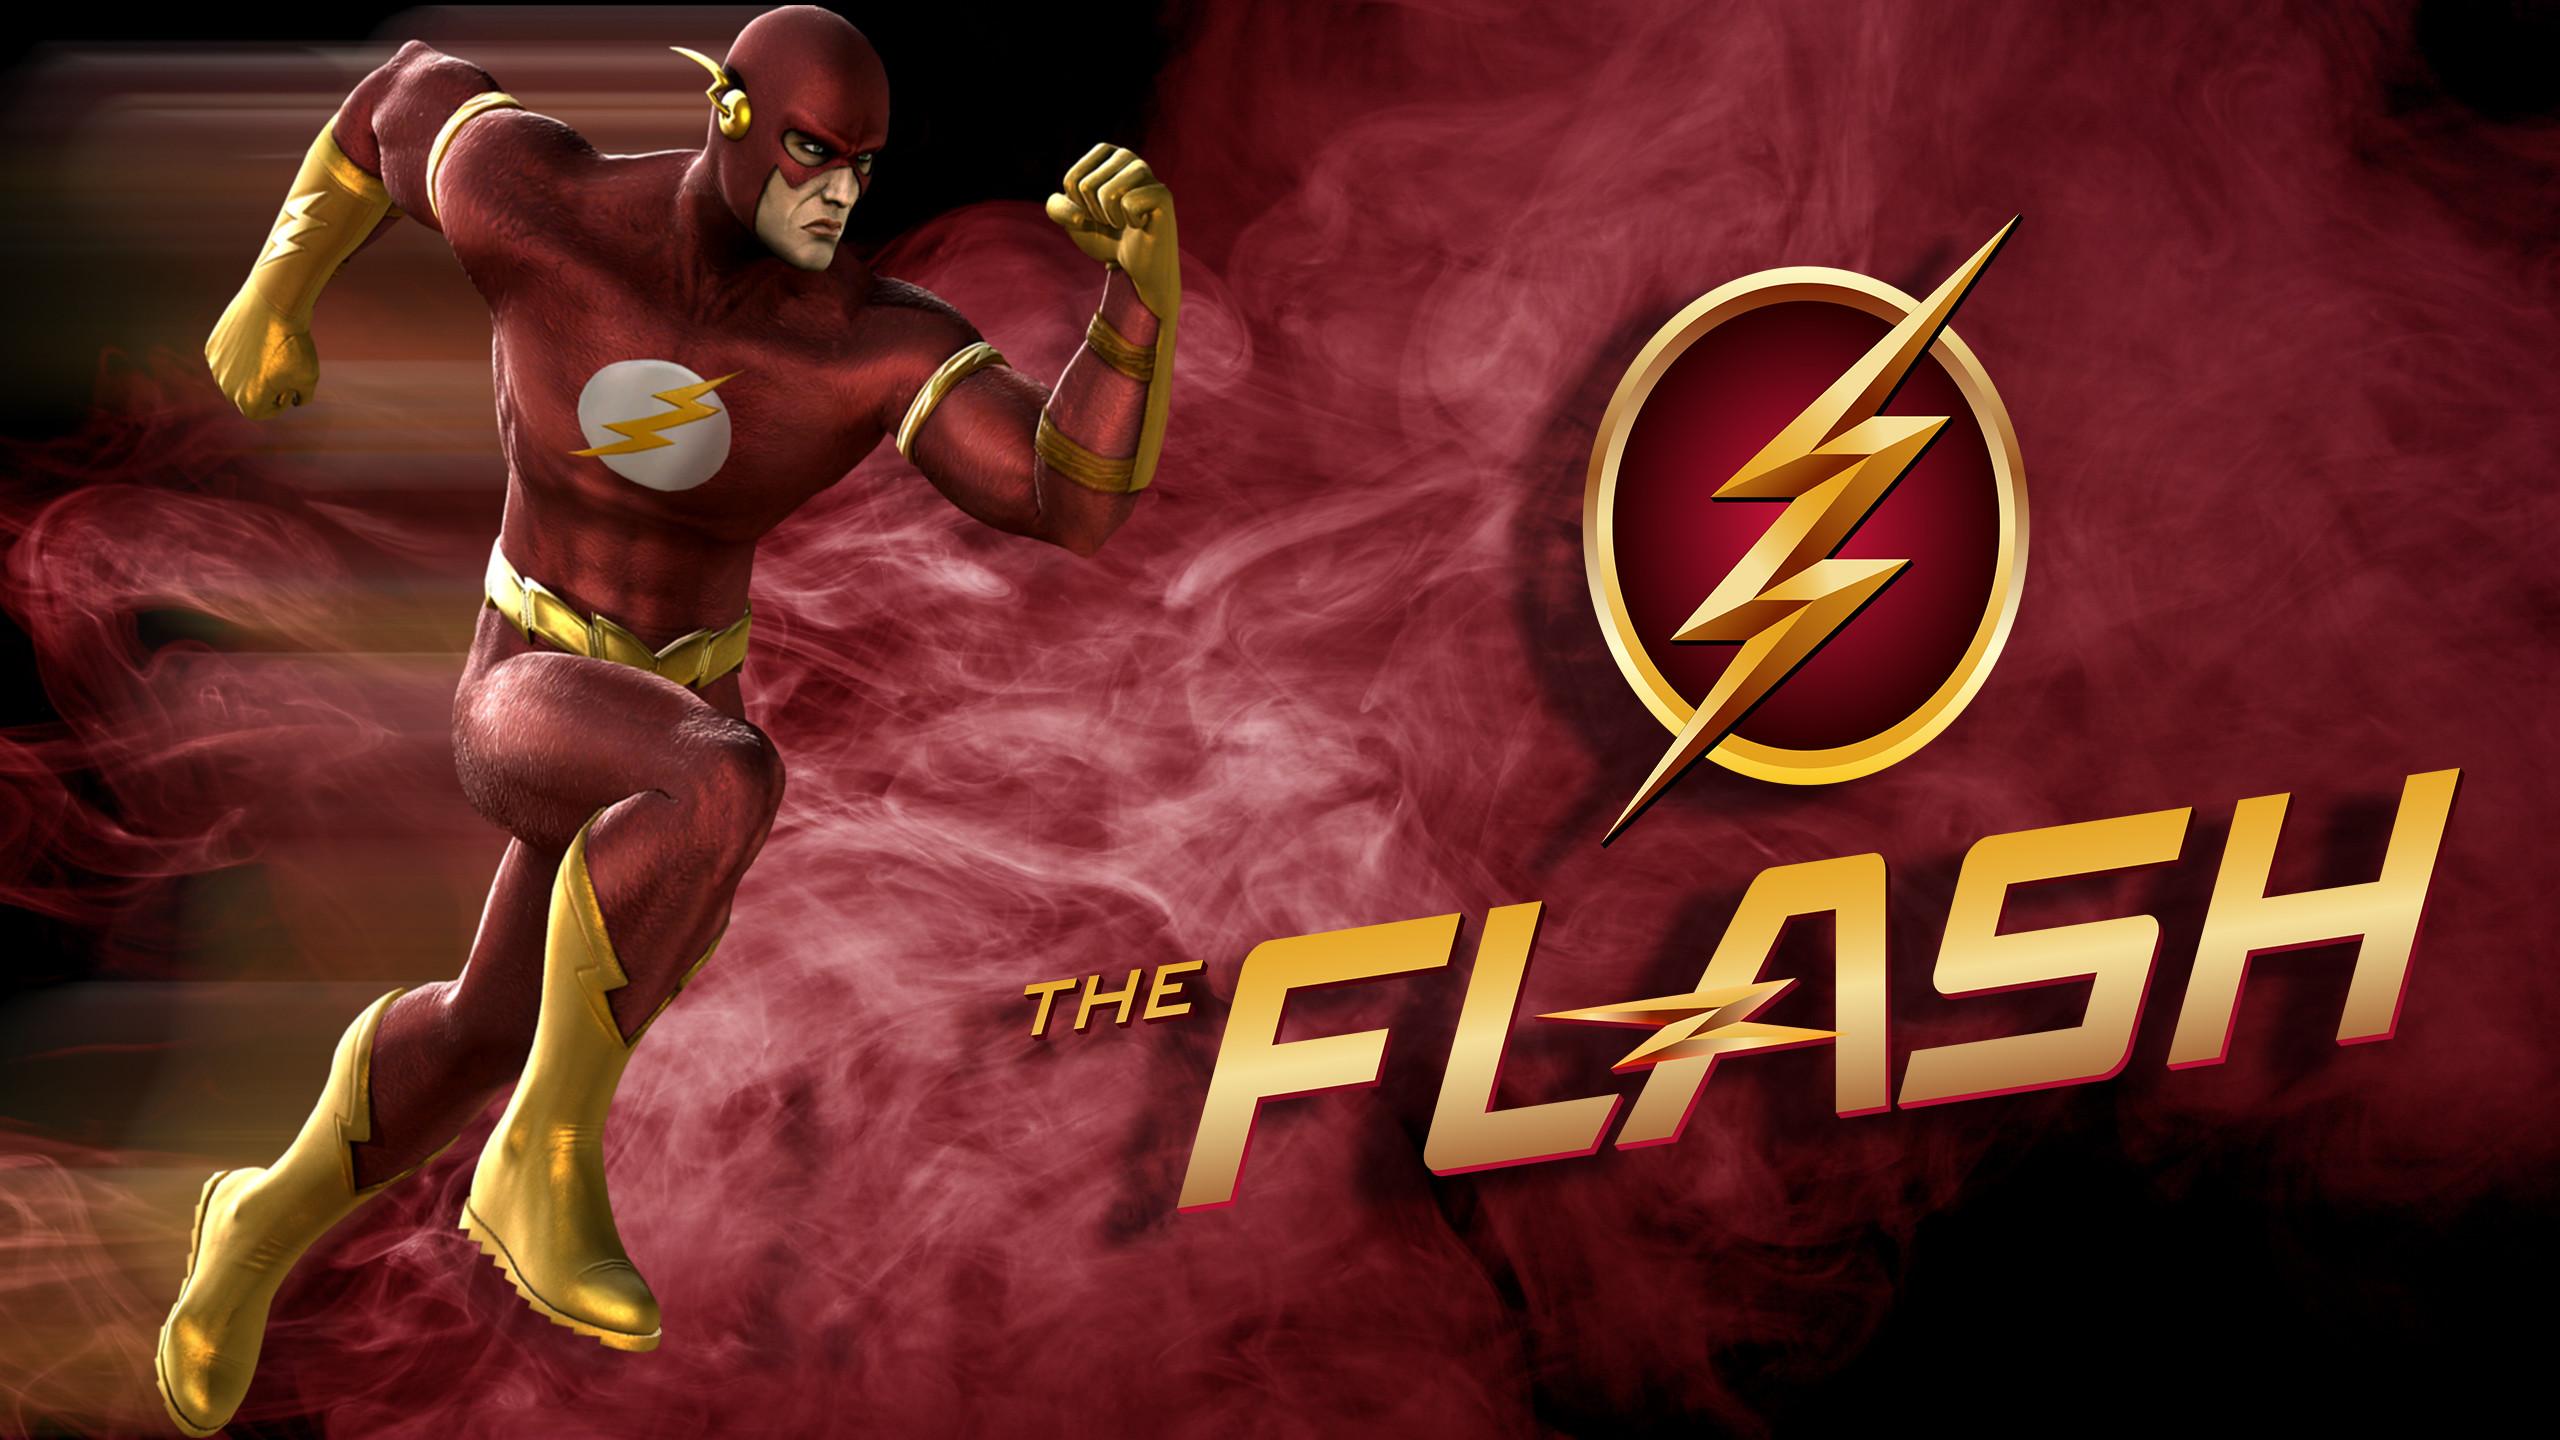 1920x1080 The Flash Logo Background